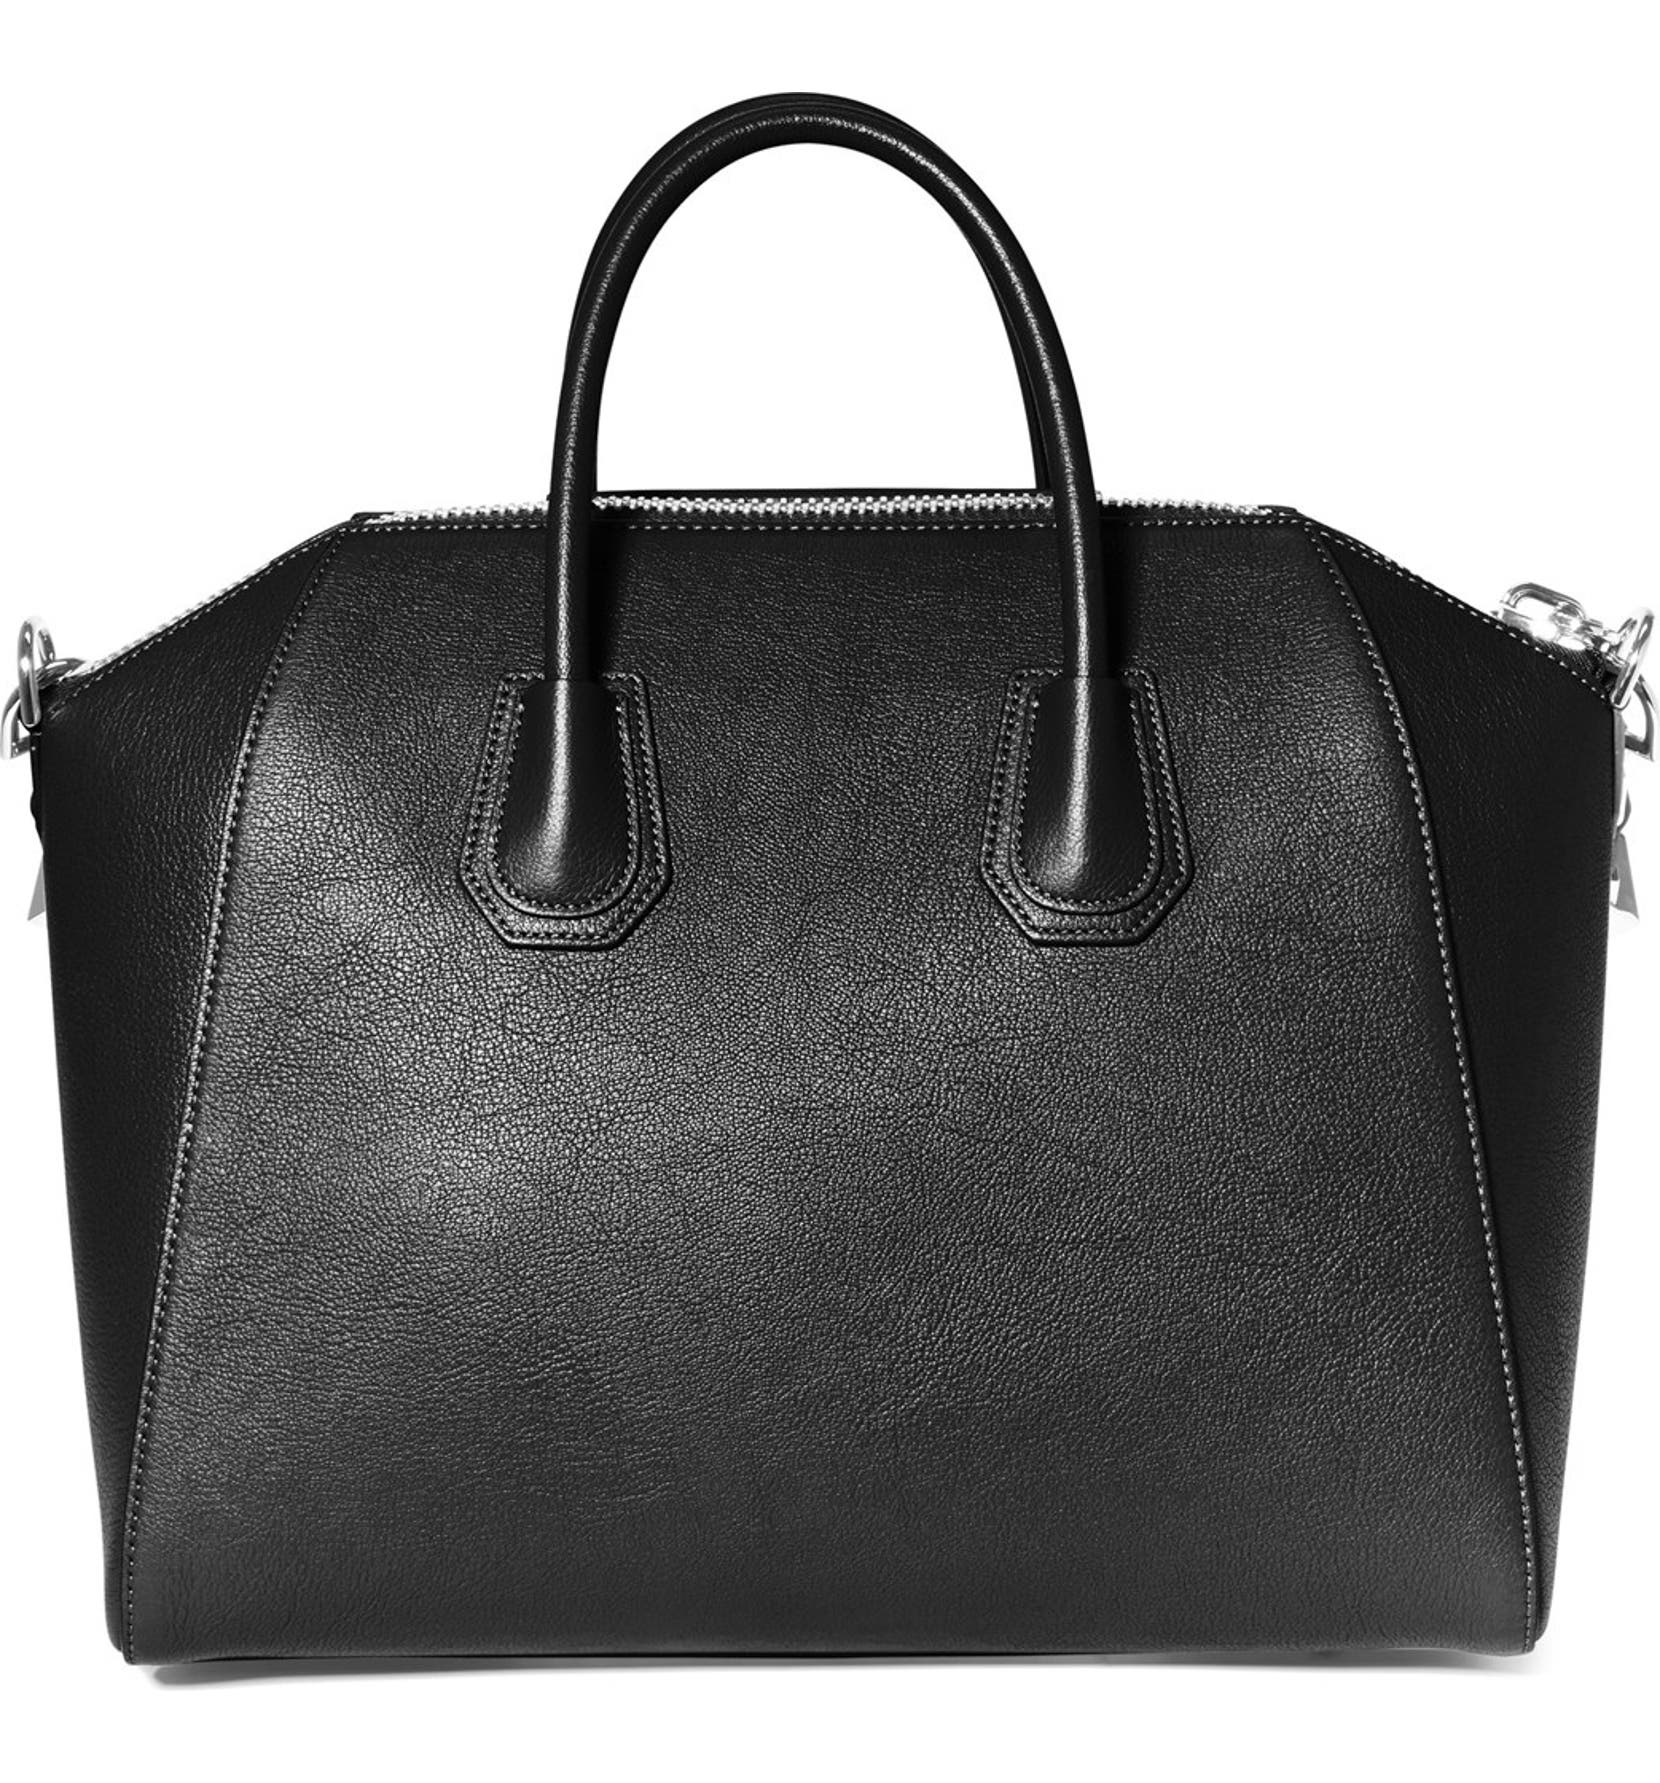 306afbfef2 Givenchy 'Medium Antigona' Sugar Leather Satchel   Nordstrom